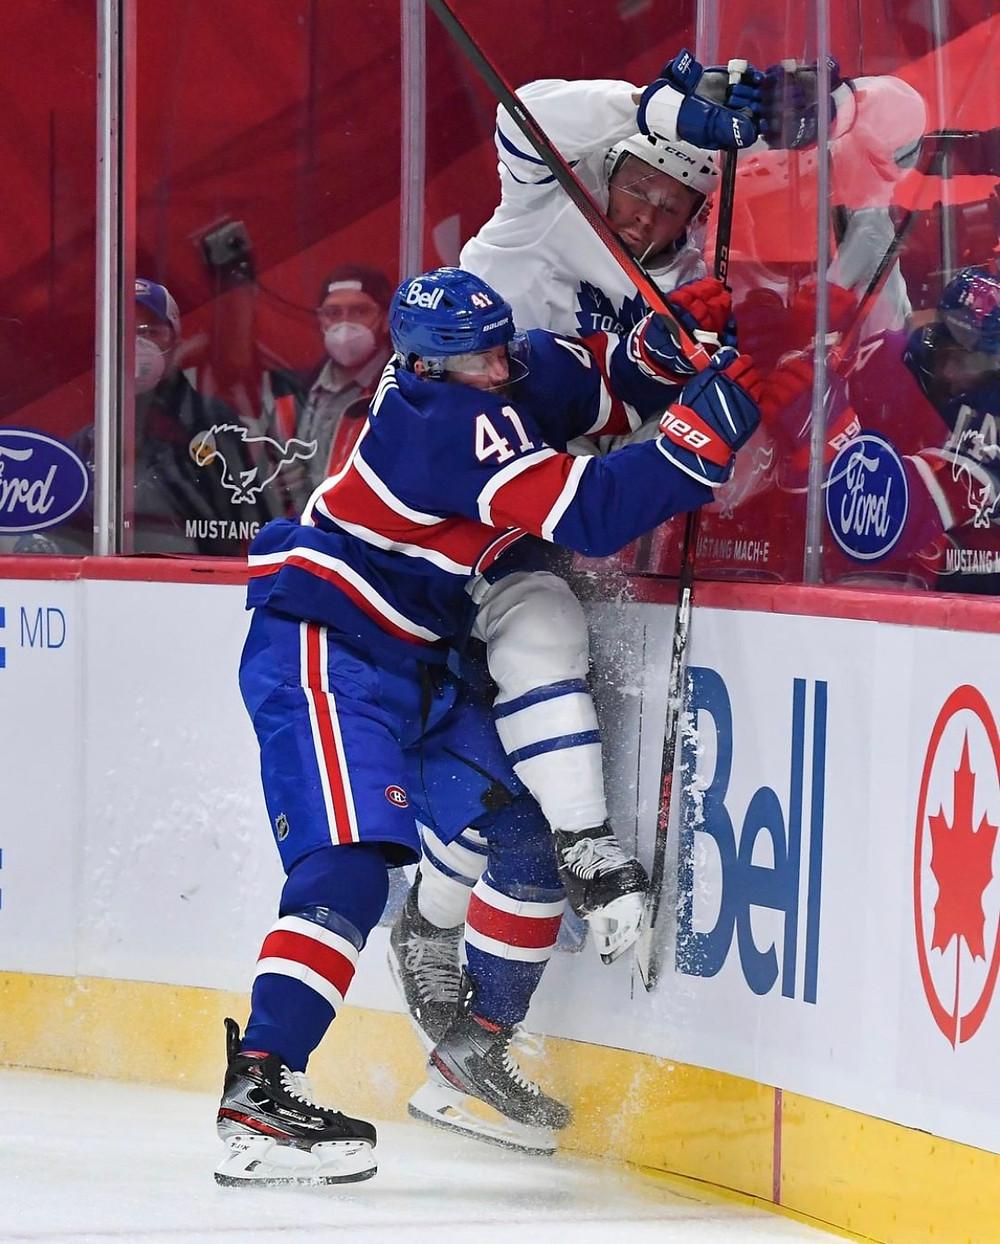 Canadiens forward Paul Byron finishes a body check on Leafs d-man Morgan Reilly